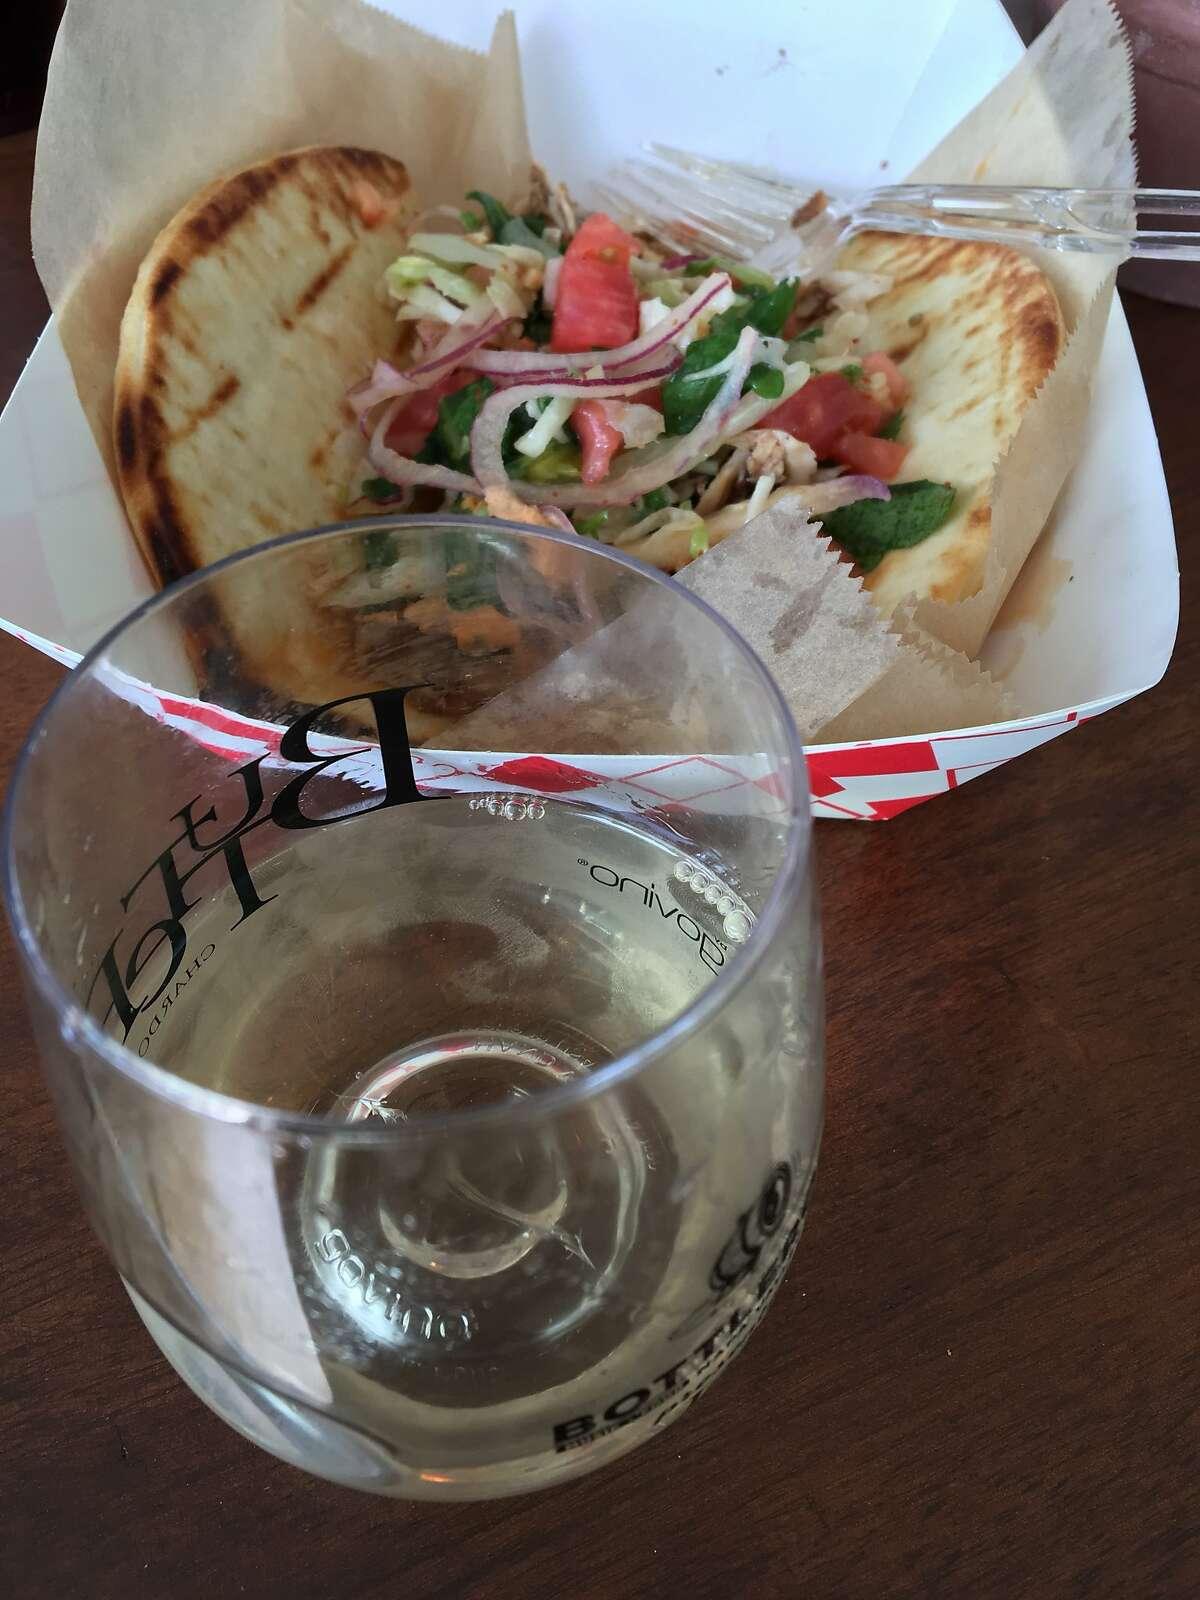 Tarla chicken kebab and Twomey Sauvignon Blanc.